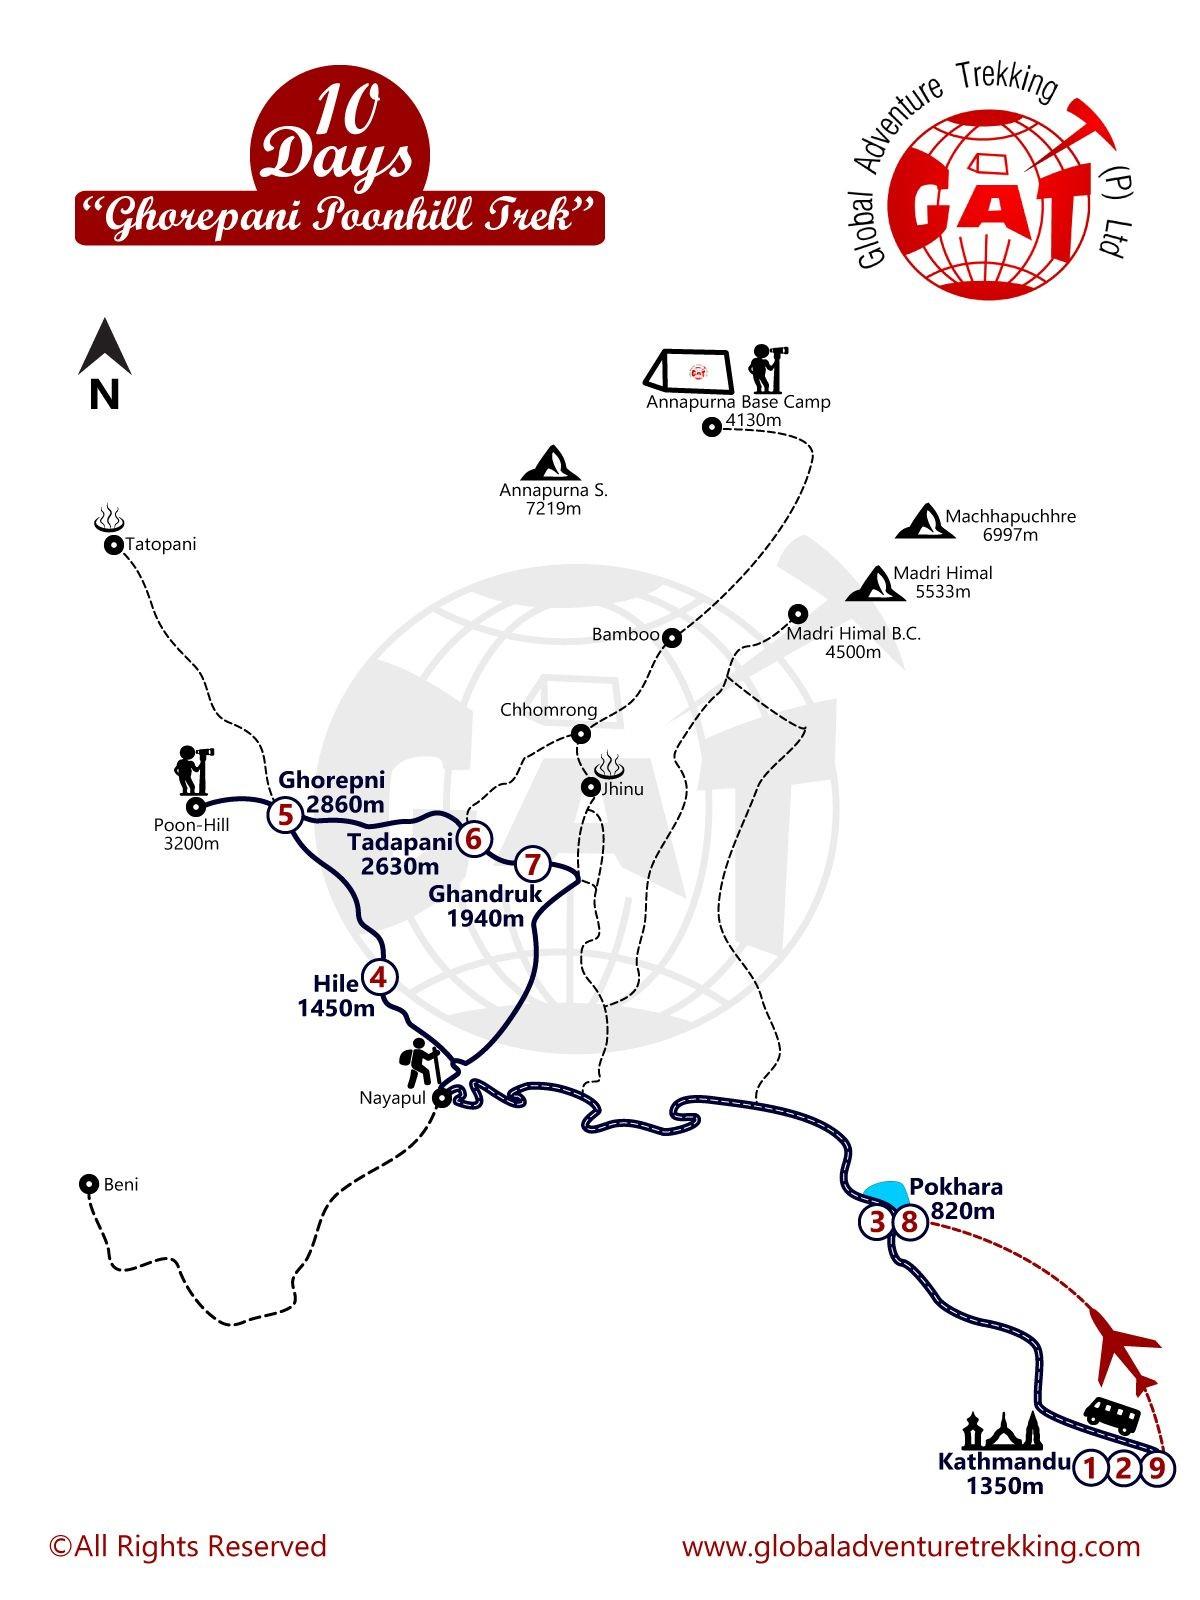 Ghorepani-Poon Hill Trek map